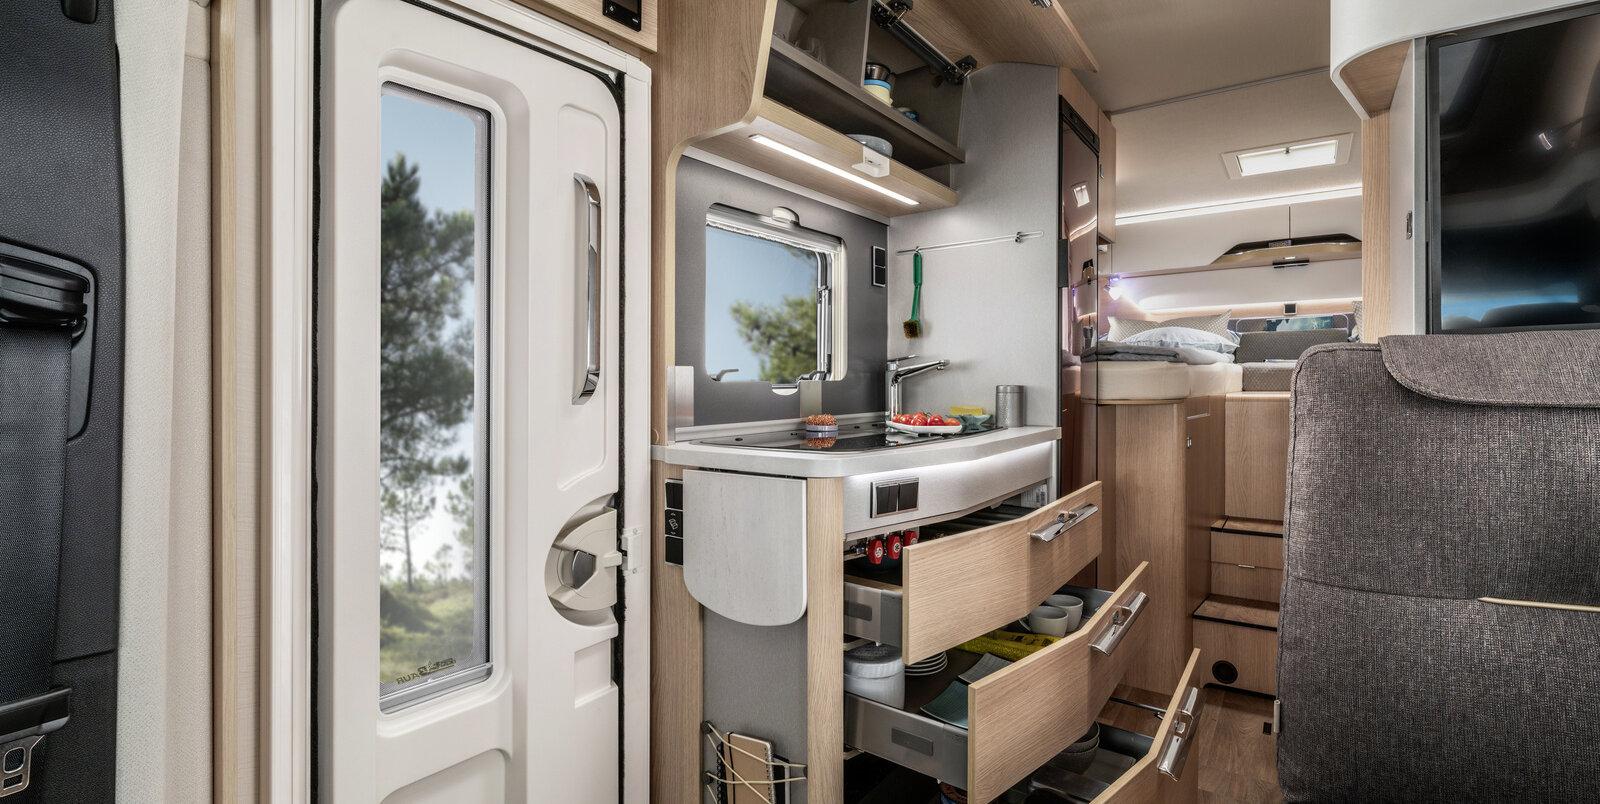 Hymer B Klasse Moderncomfort I In Een Notendop Hymer Camper